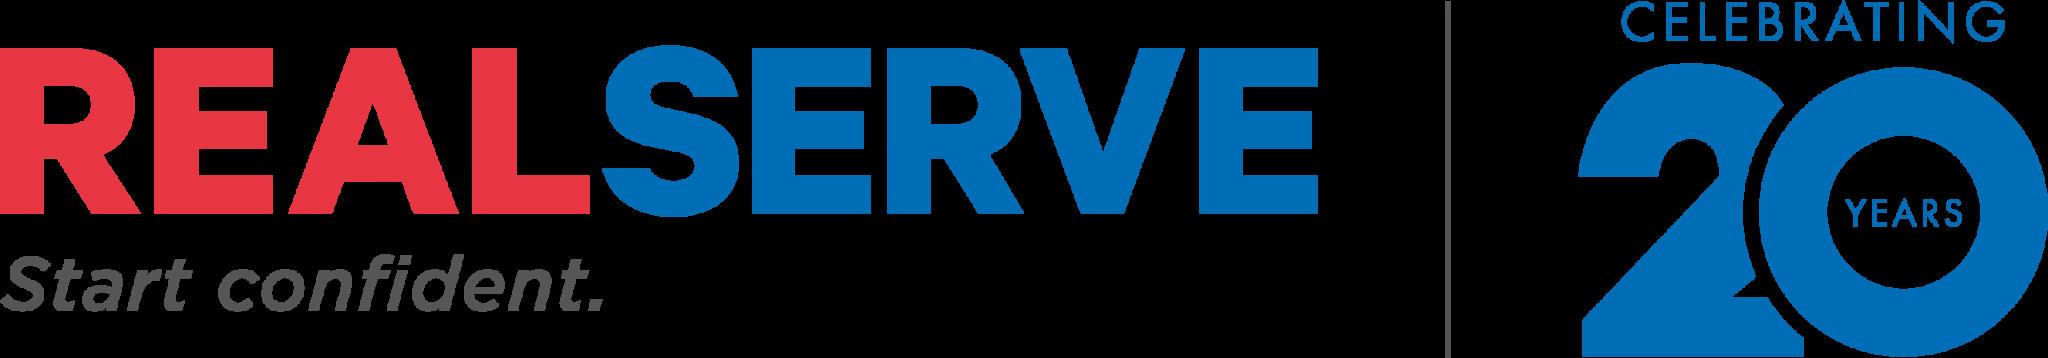 Realserve Pty Ltd New Zealand Property Surveys and Measurement Logo